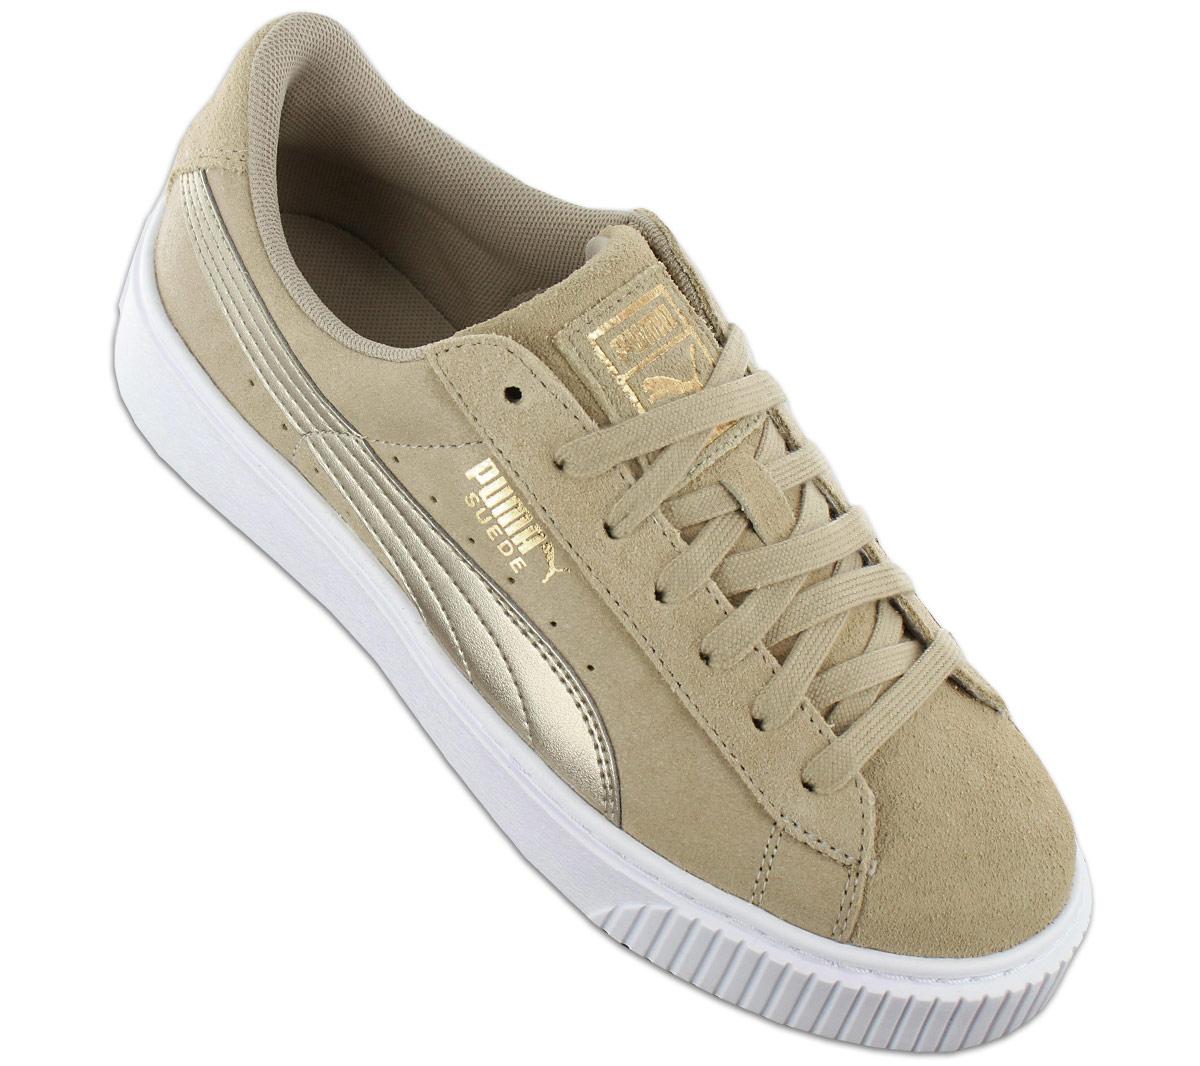 Nuevo Puma Gamuza Safari Wns 364594-01 Mujeres Plataforma Zapatos Zapatos Zapatos Zapatillas zapatillas Venta  Felices compras